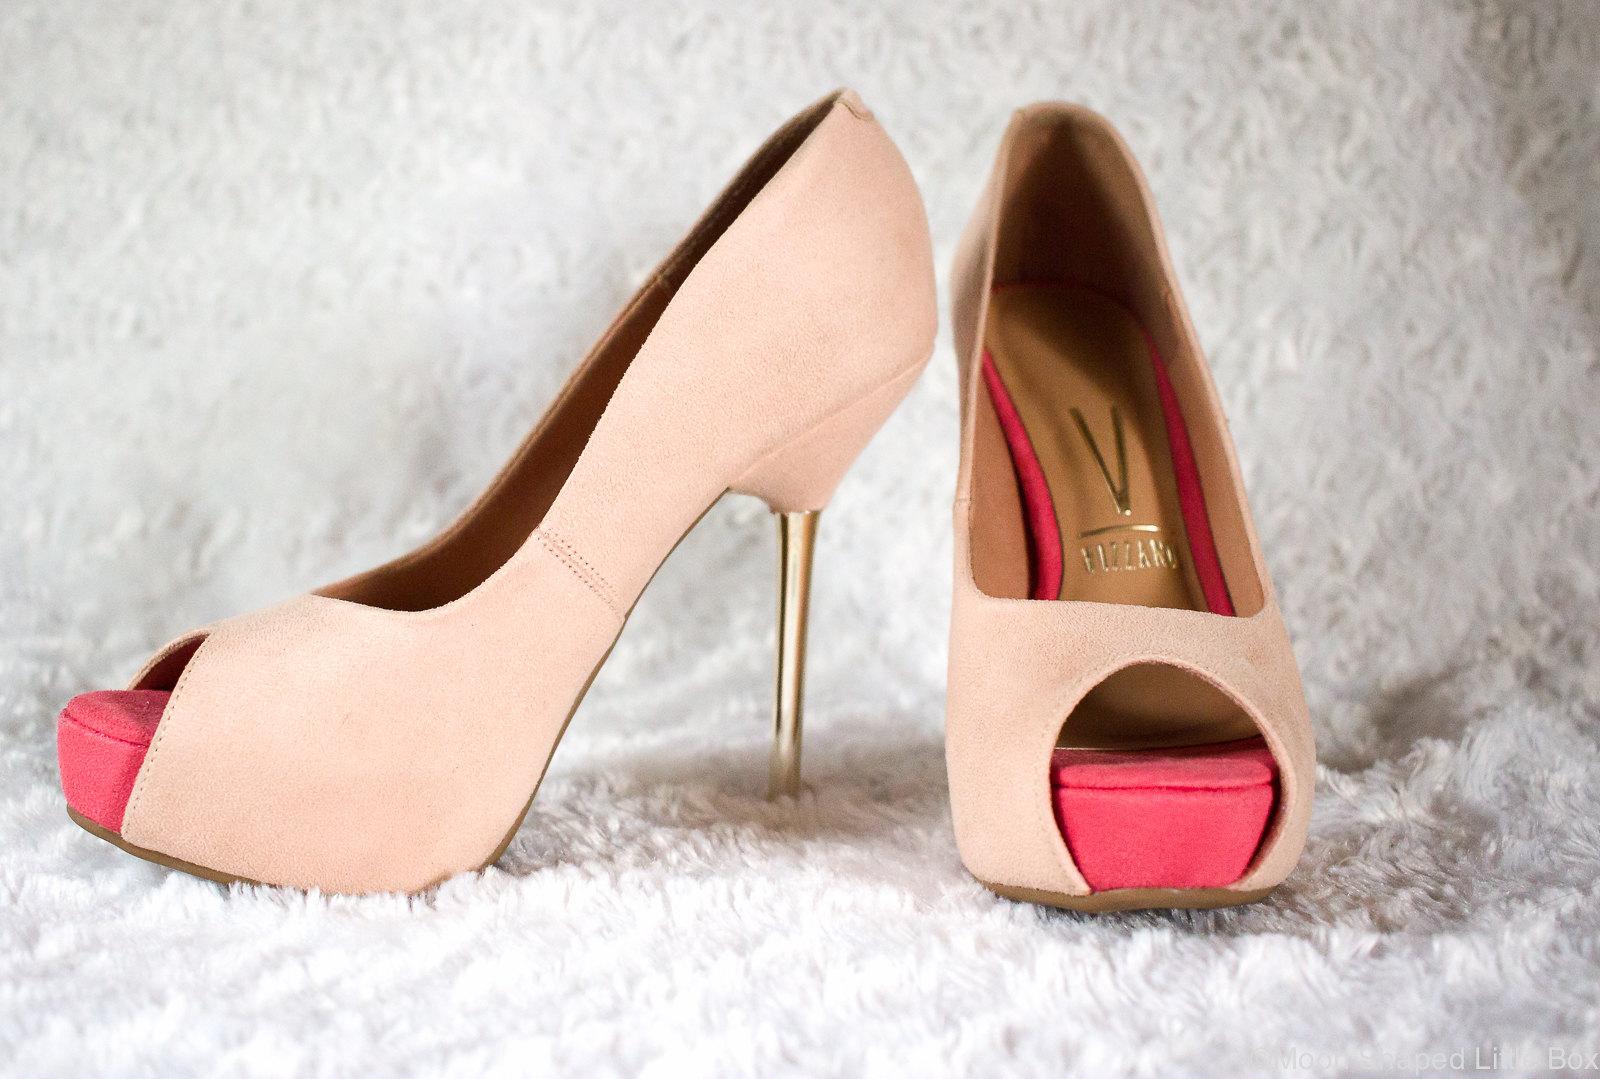 light_pink_heels_from_spain